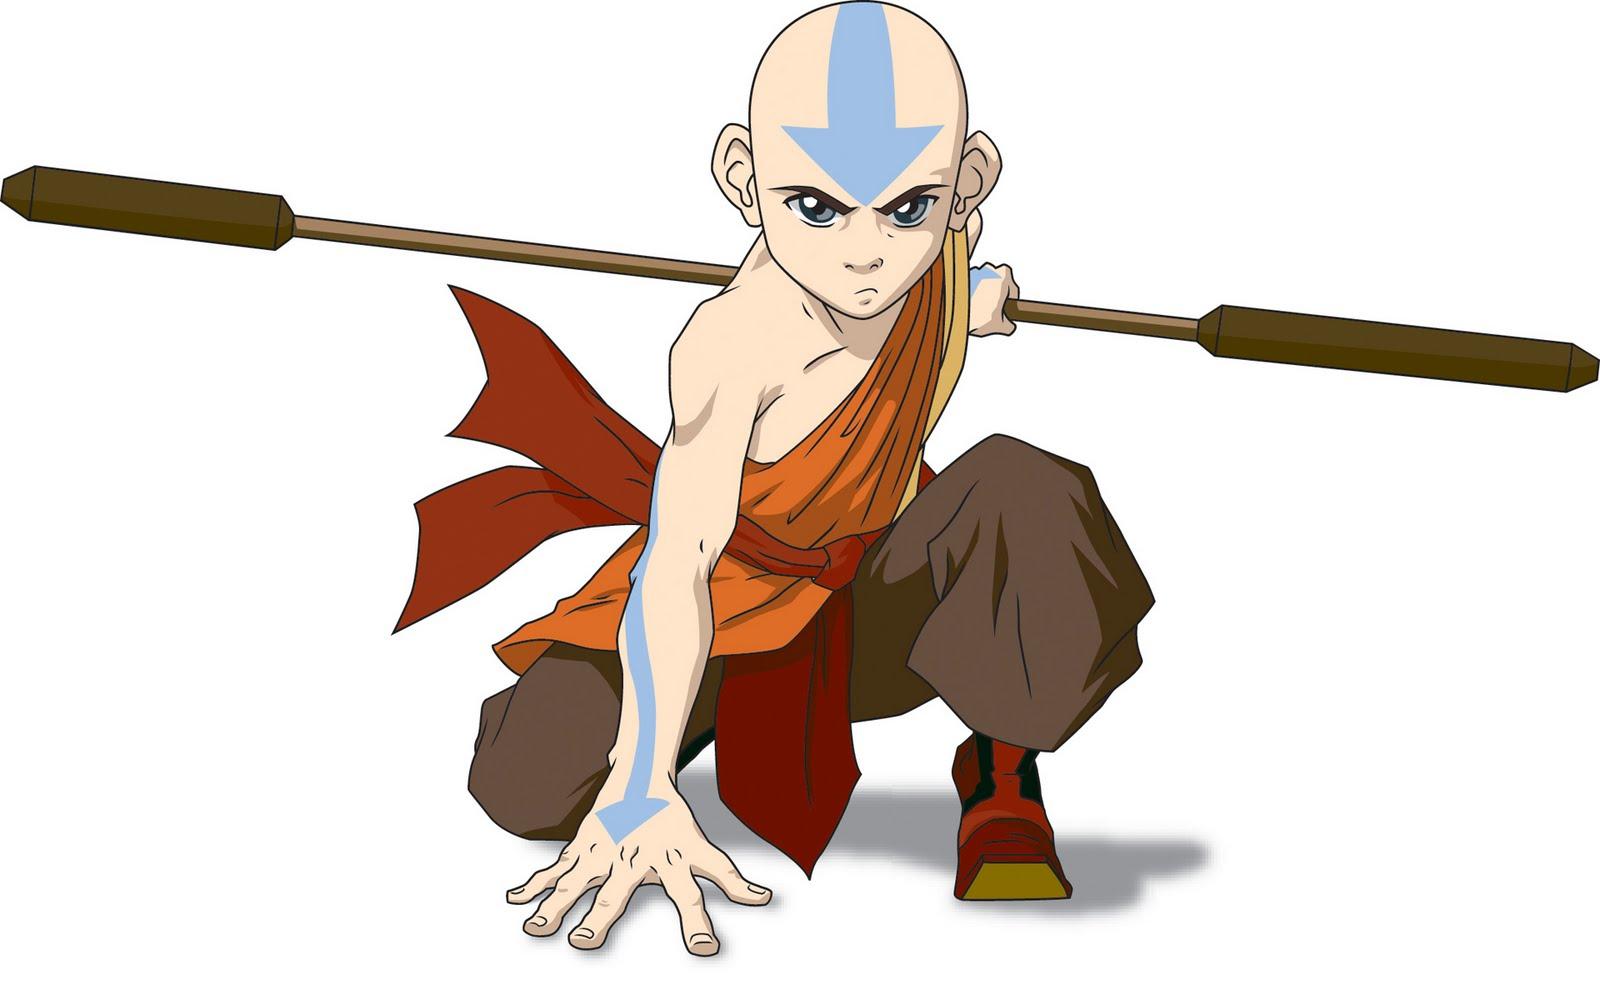 Avatar The Last Airbender HD Anime Wallpapers | Desktop ...